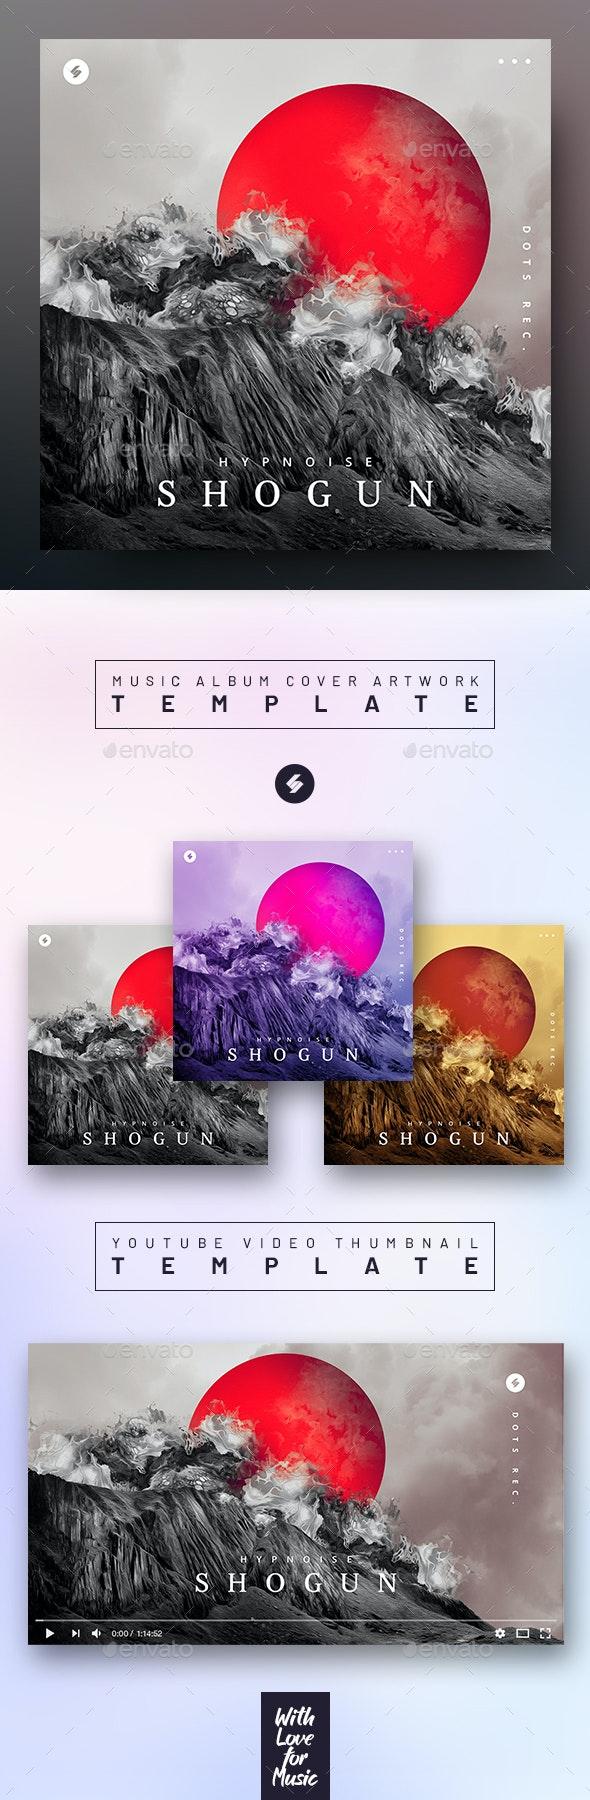 Shogun – Music Album Cover Artwork / Youtube Video Thumbnail Template - Miscellaneous Social Media